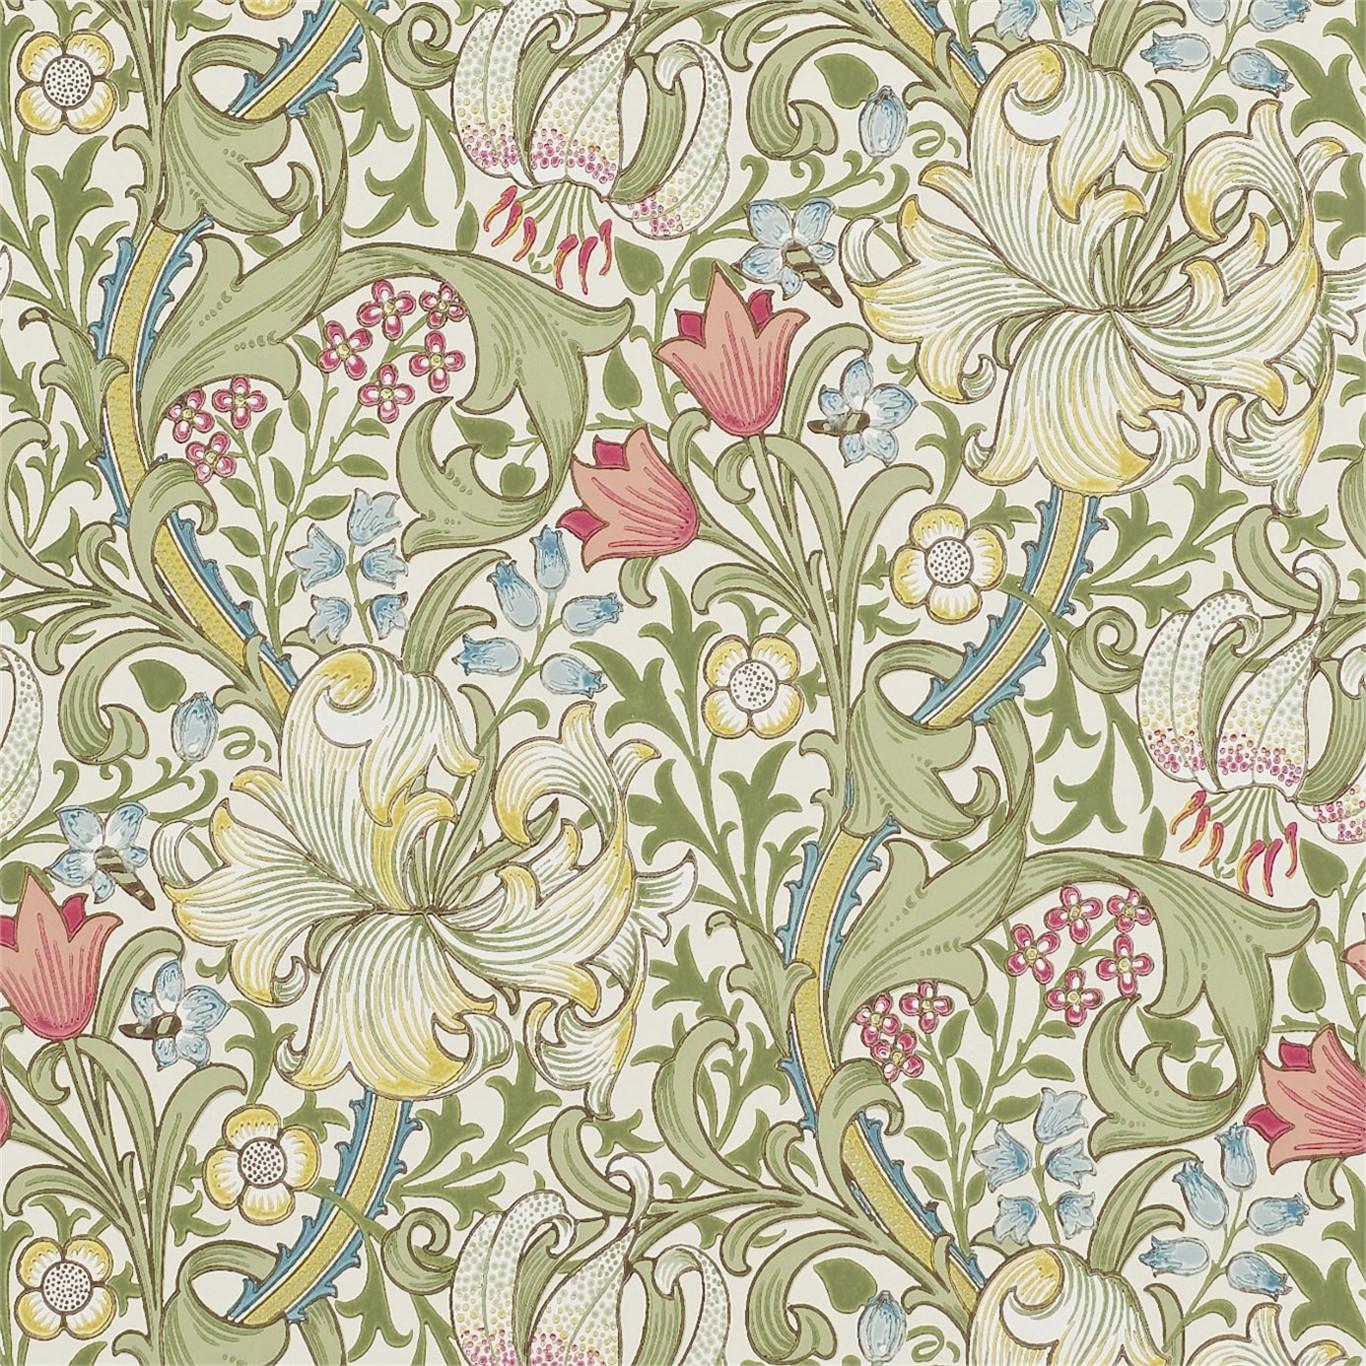 Tapet William Morris Golden Lily 216460